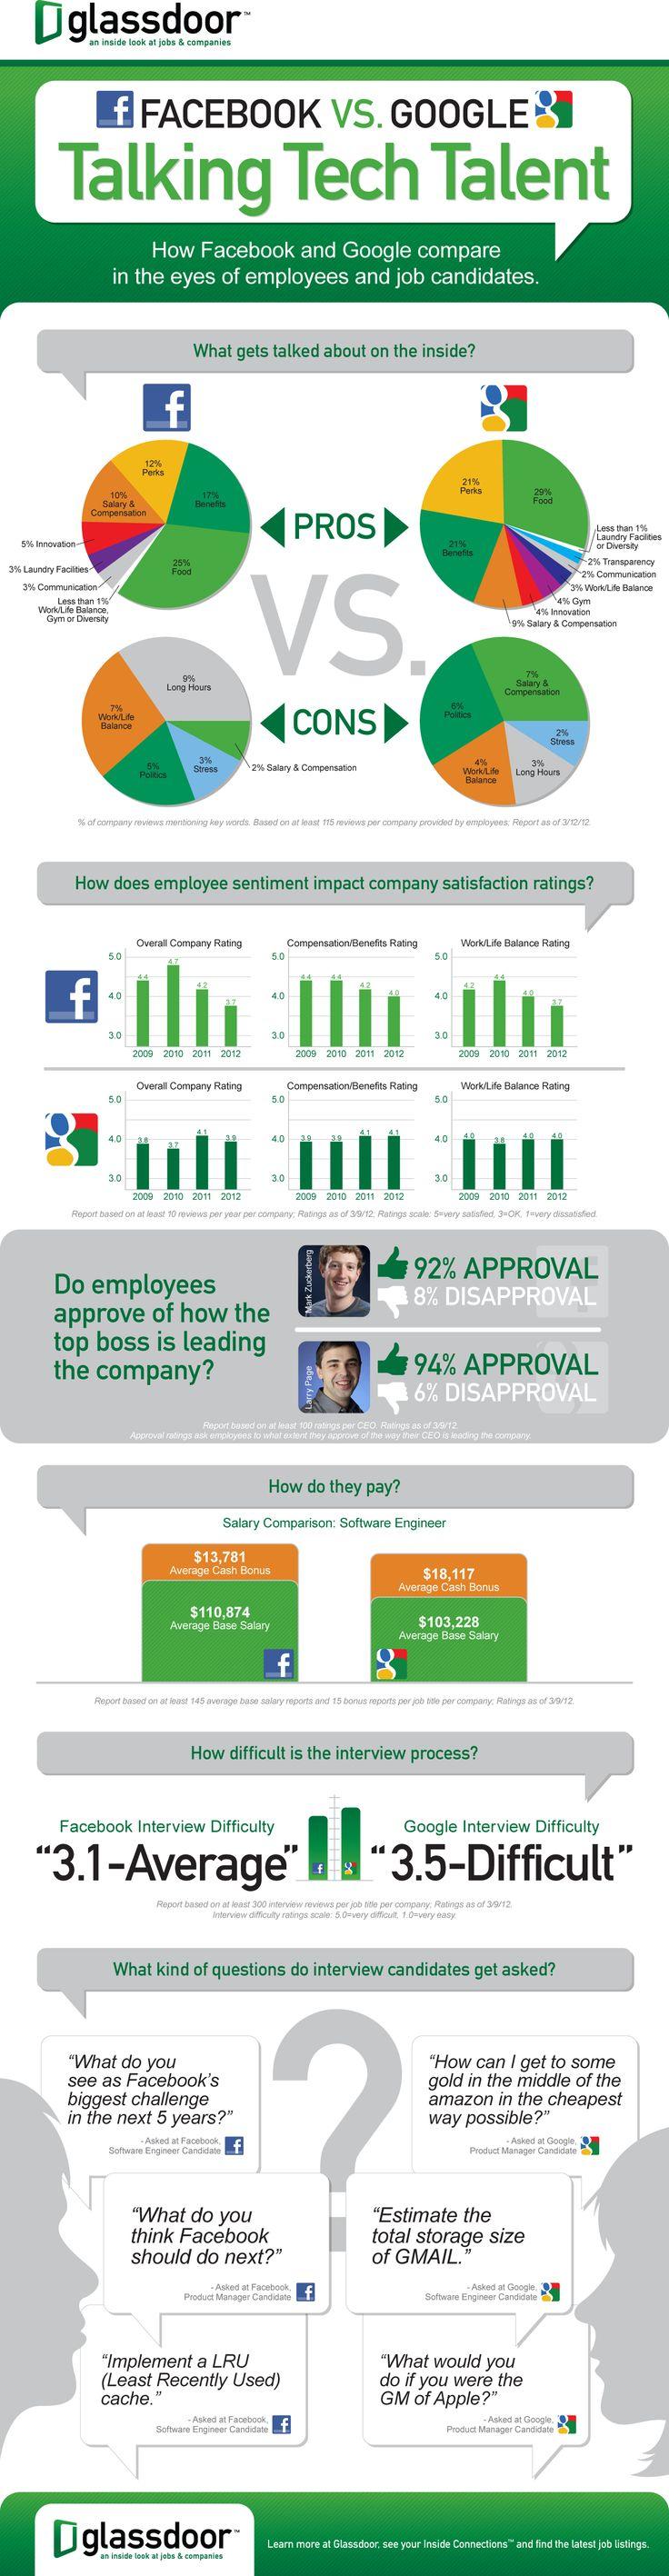 Facebook vs Google: Talking Tech Talent.: Google Overtak, Social Media Marketing, Talk Tech, Website, Web Site, Tech Talent, Internet Site, Employment Satisfaction, Overtak Facebook